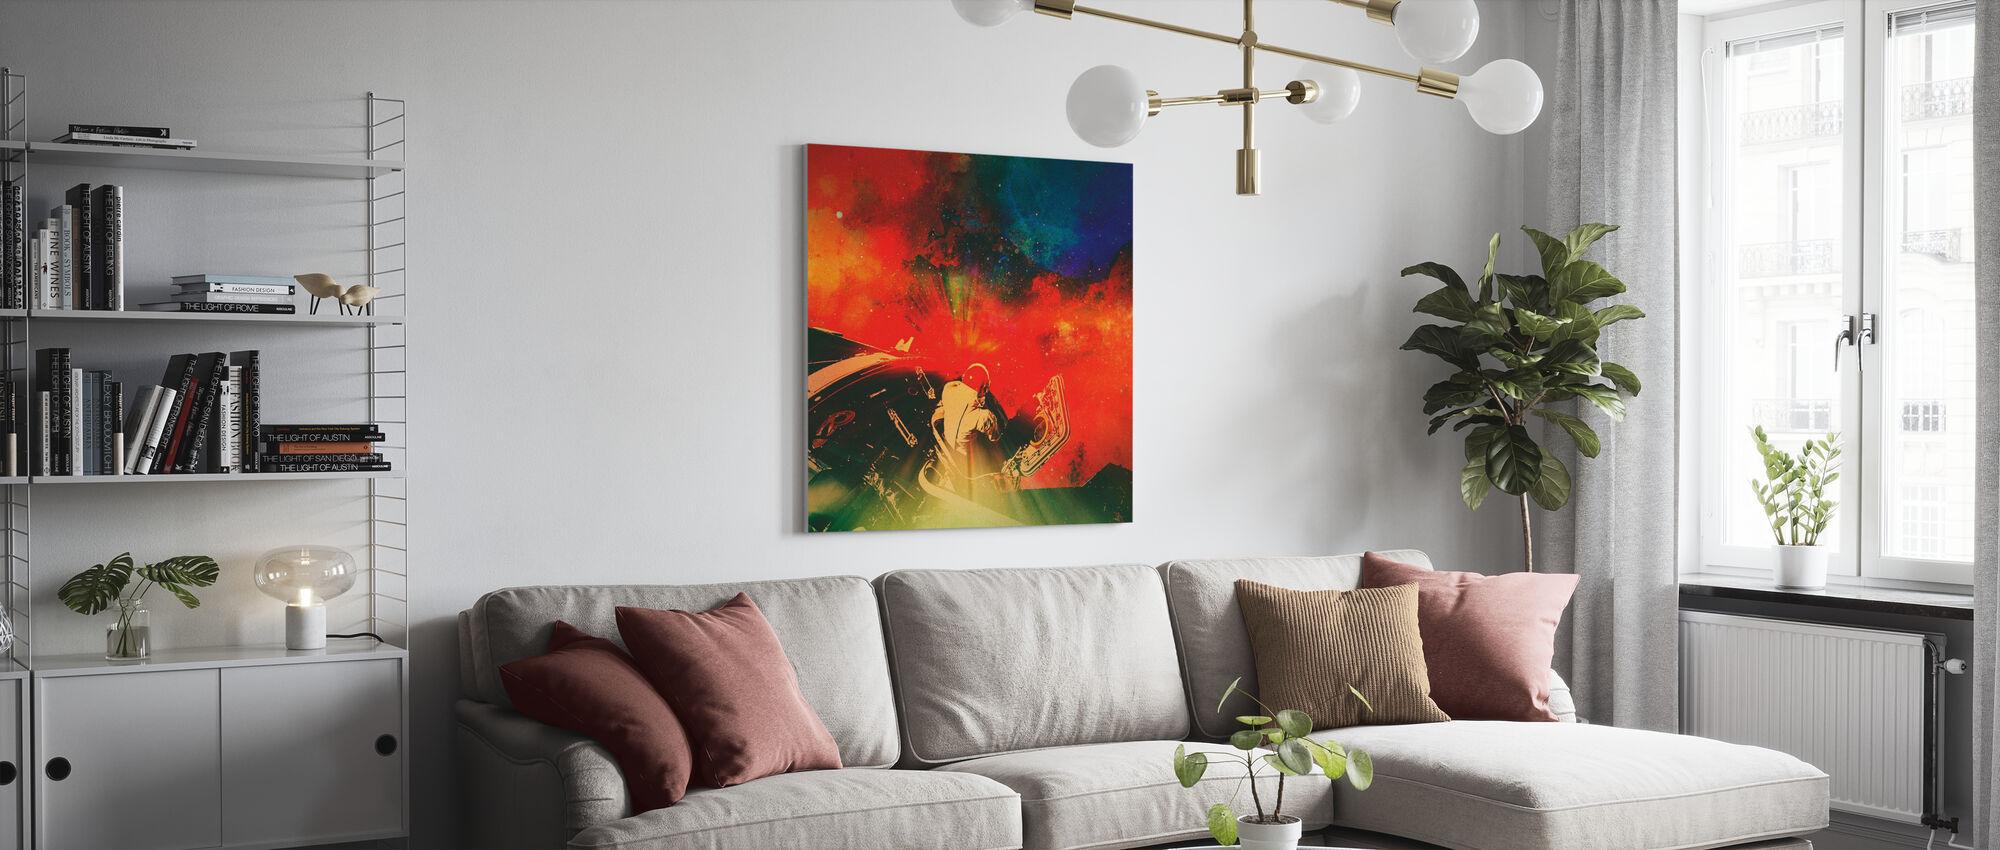 Psychonaut - Canvas print - Living Room